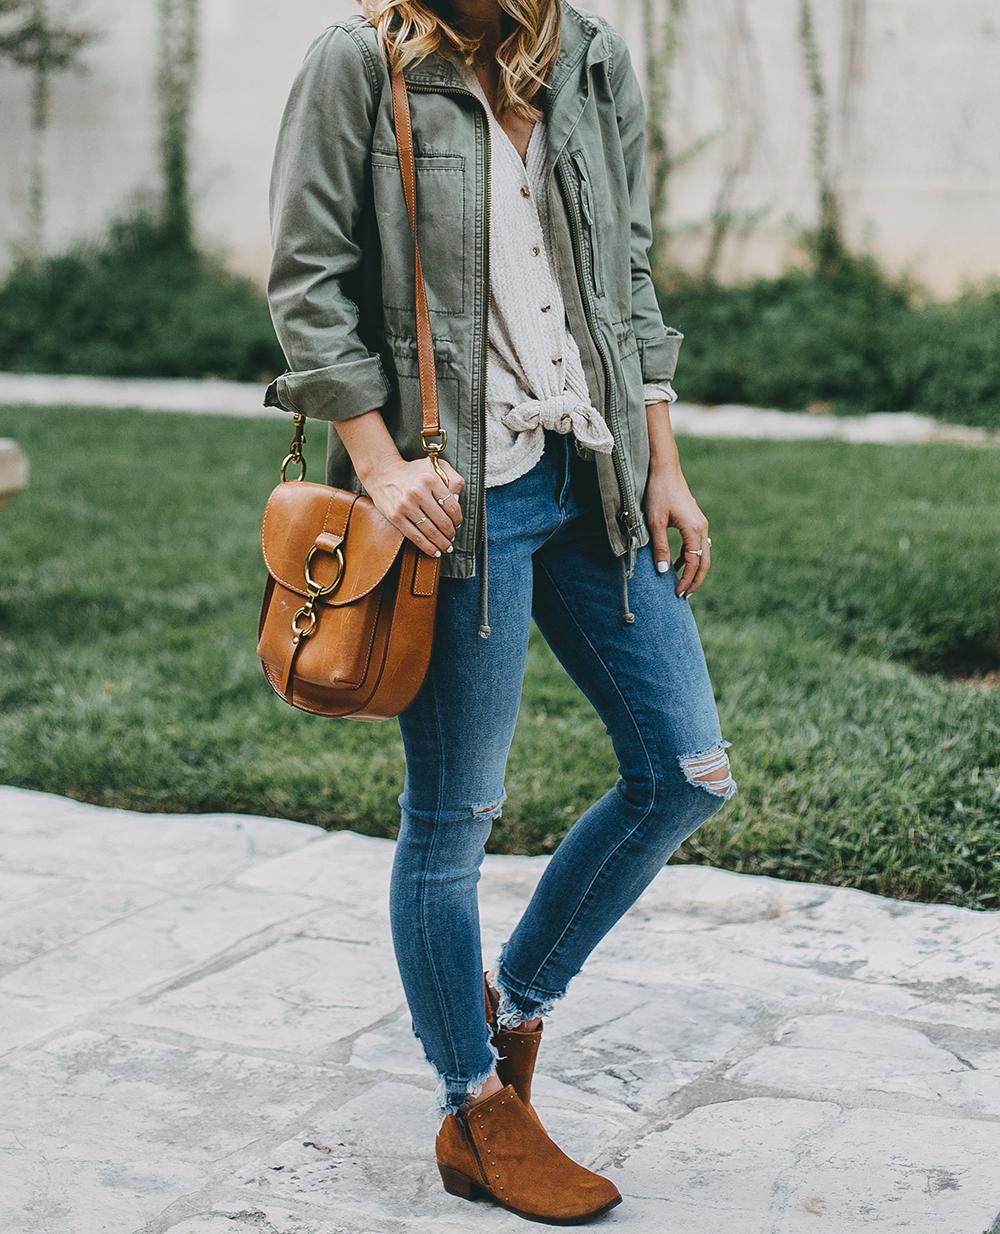 livvyland-blog-olivia-watson-austin-texas-fashion-blogger-minnatonka-moccasins-tan-suede-ankle-booties-madewell-utility-fleet-jacket-1